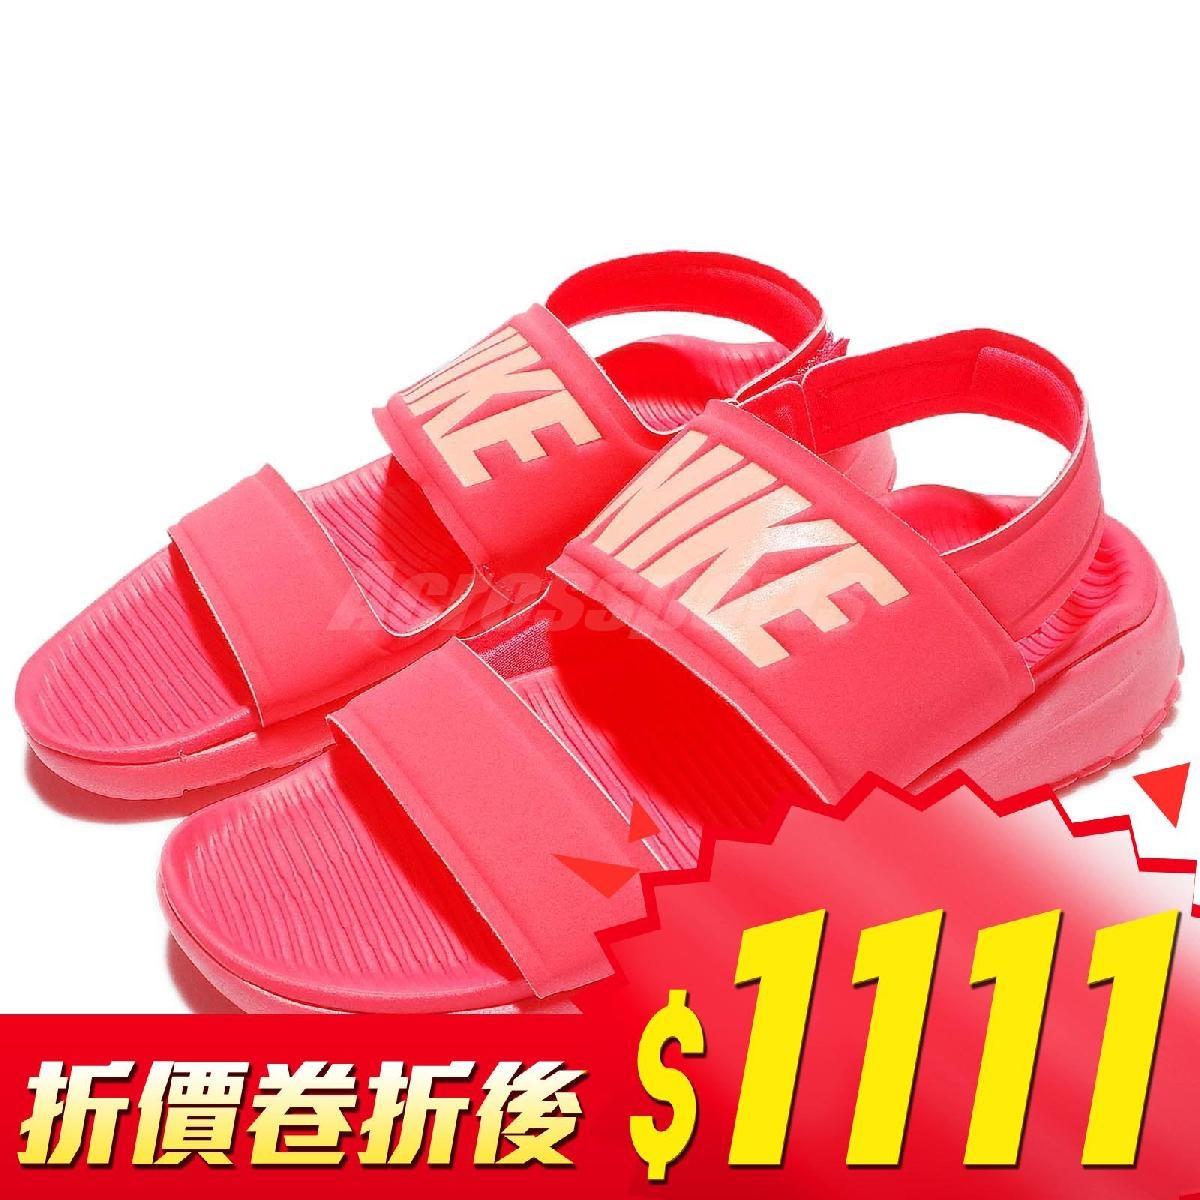 Nike涼鞋Wmns Tanjun Sandal粉紅魔鬼氈設計大LOGO涼拖鞋女鞋PUMP306 882694-600